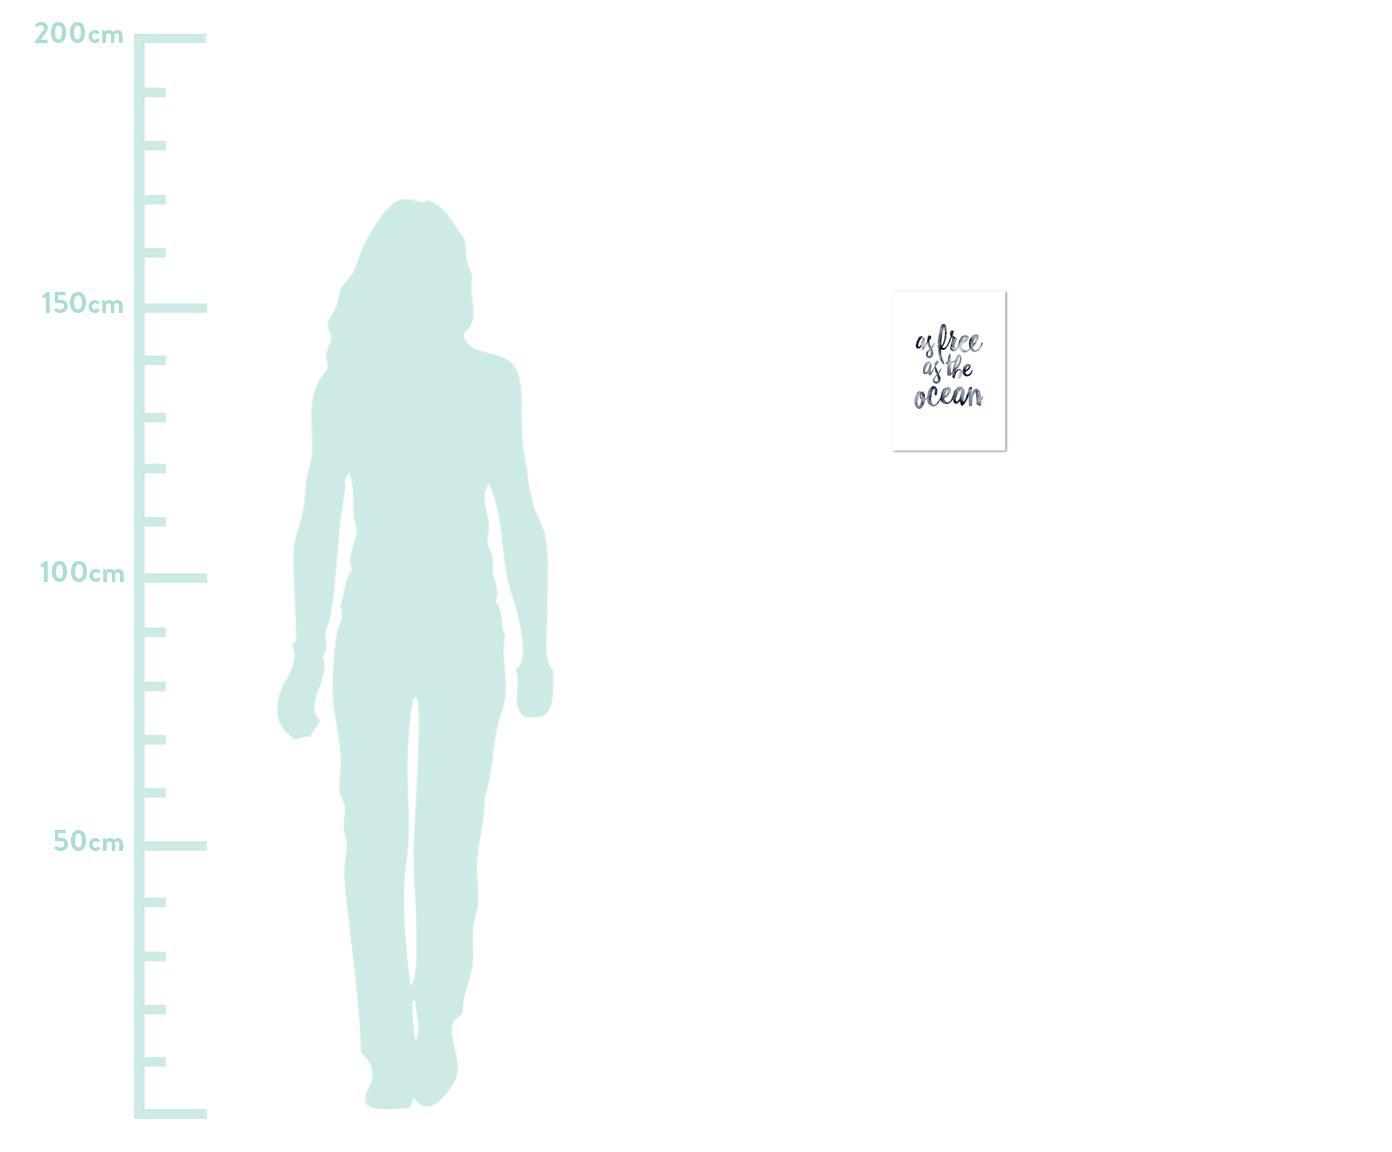 Poster As Free As The Ocean, Digitaldruck auf Papier, 200 g/m², Dunkelblau, Weiß, 21 x 30 cm